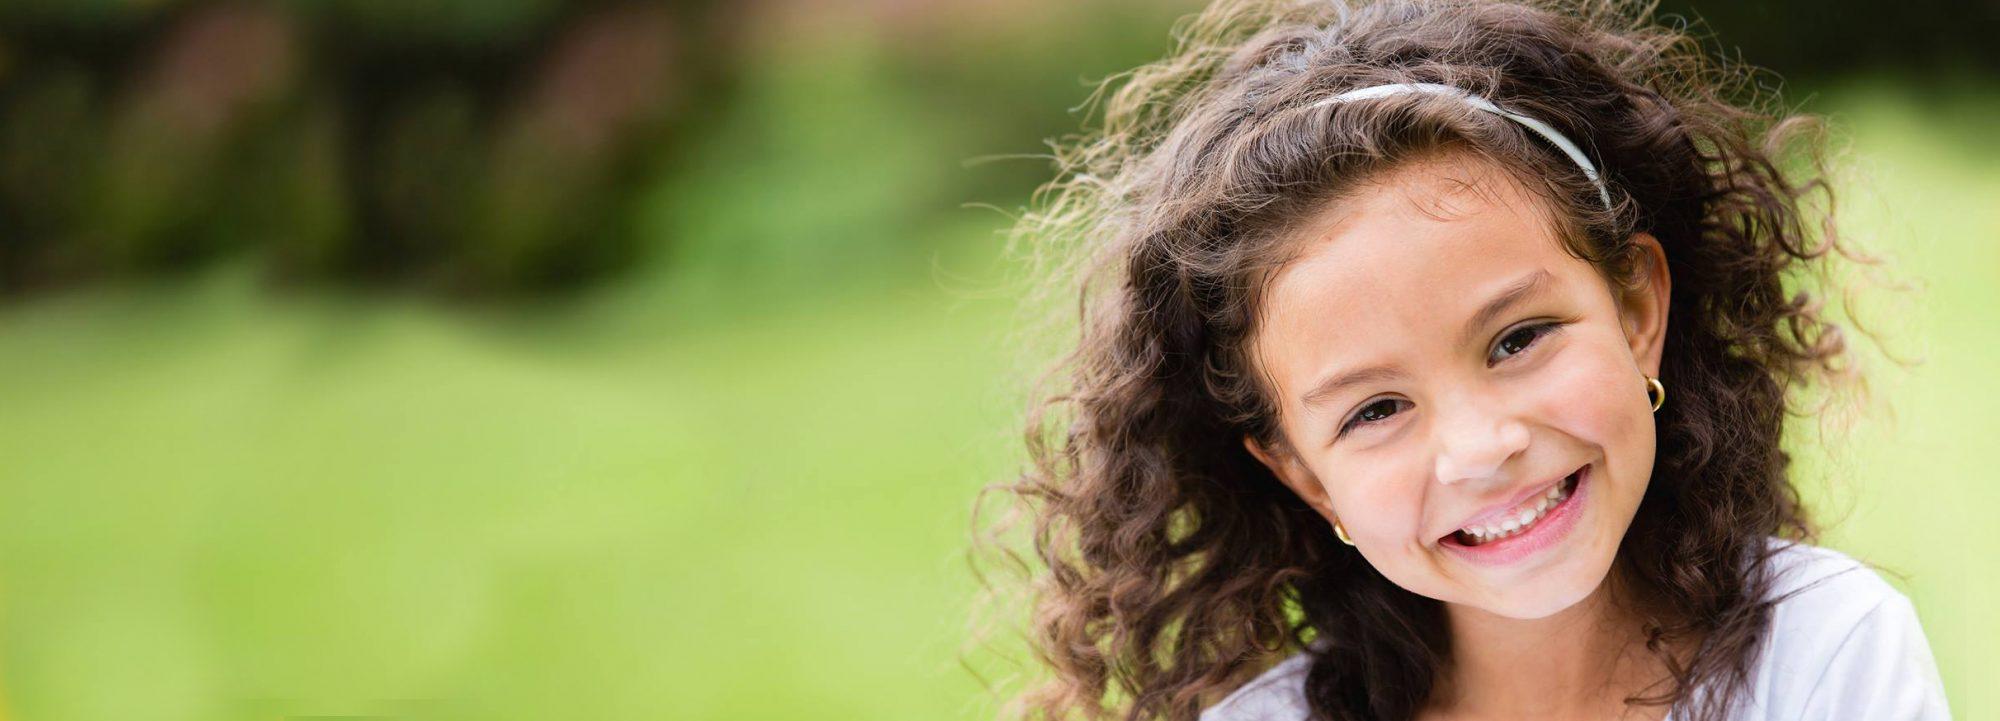 Smiling little girl at Montessori Kids Universe school